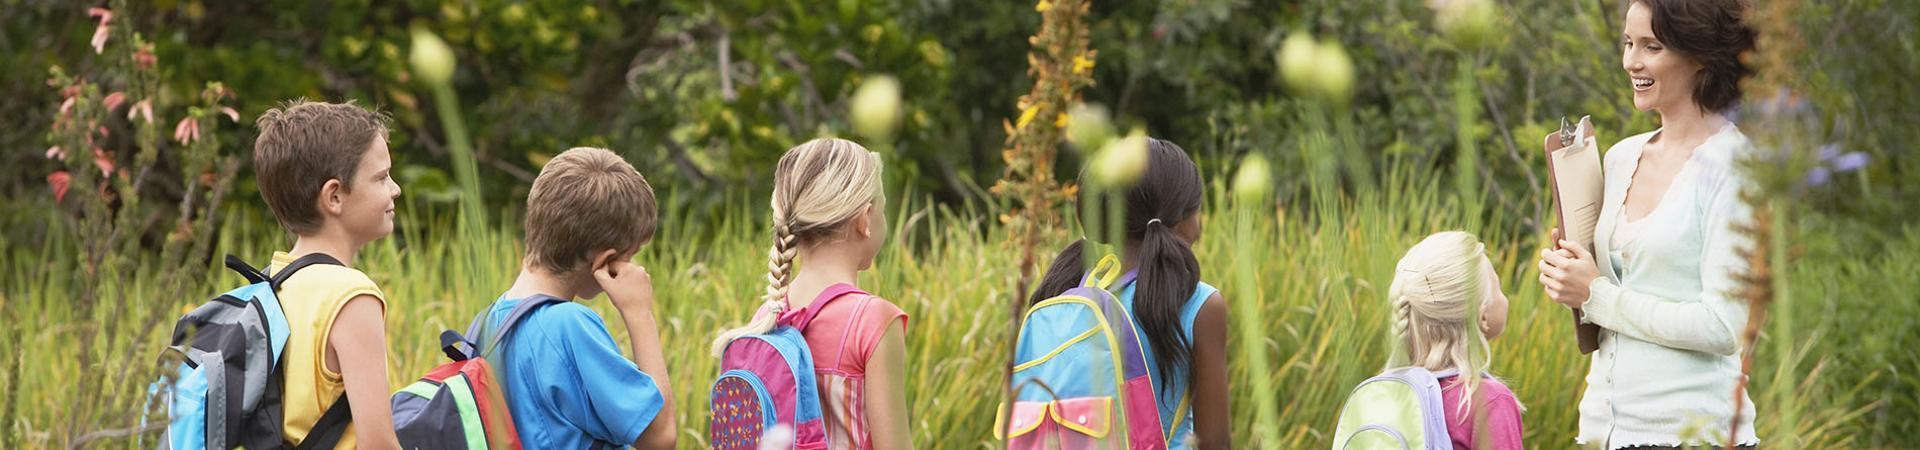 Kids and Teacher in Field